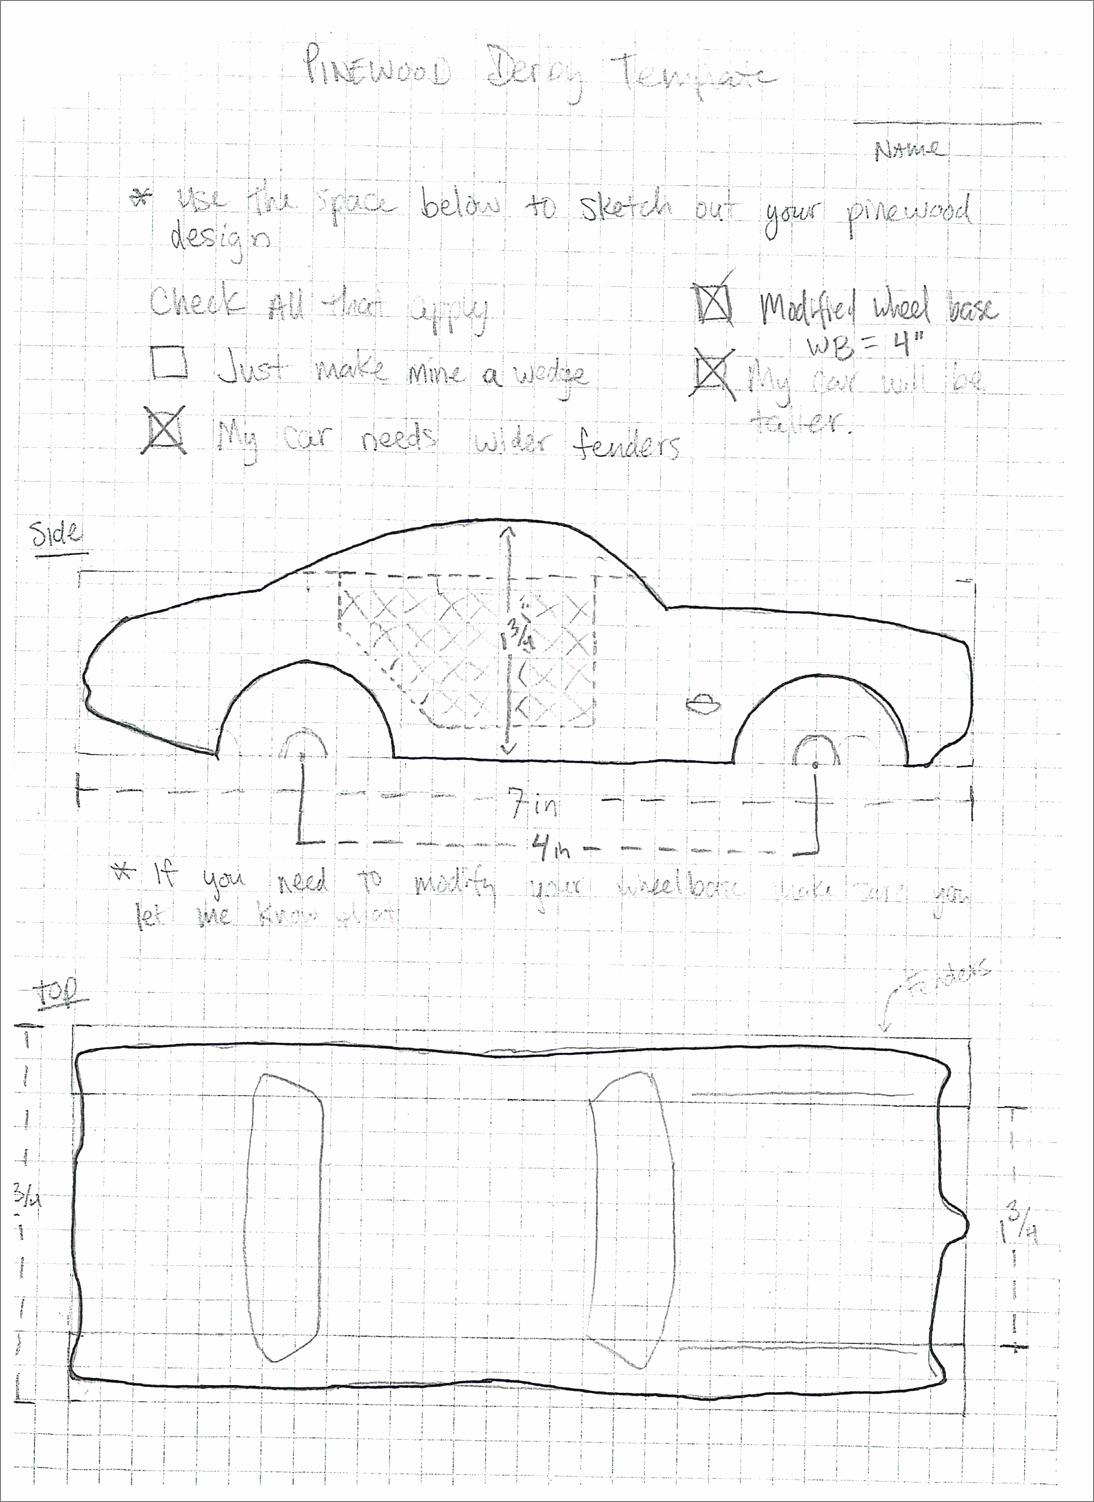 Bonus Sketchup assignment Pinewood Derby